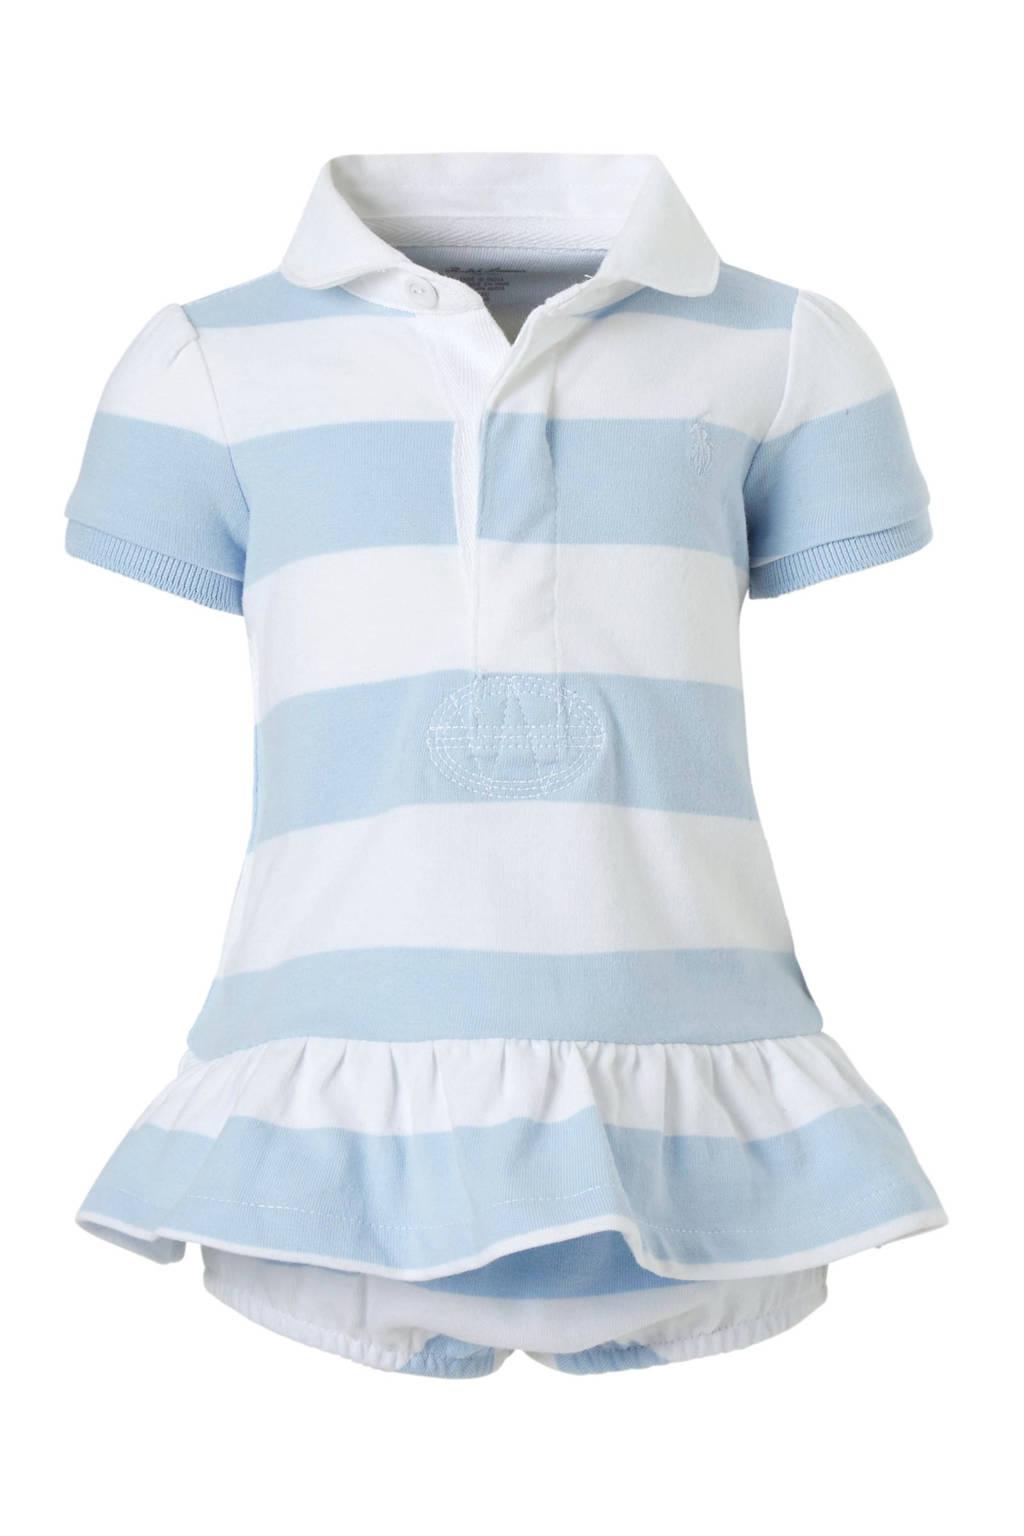 POLO Ralph Lauren gestreepte baby jurk met broek lichtblauw, Lichtblauw/wit